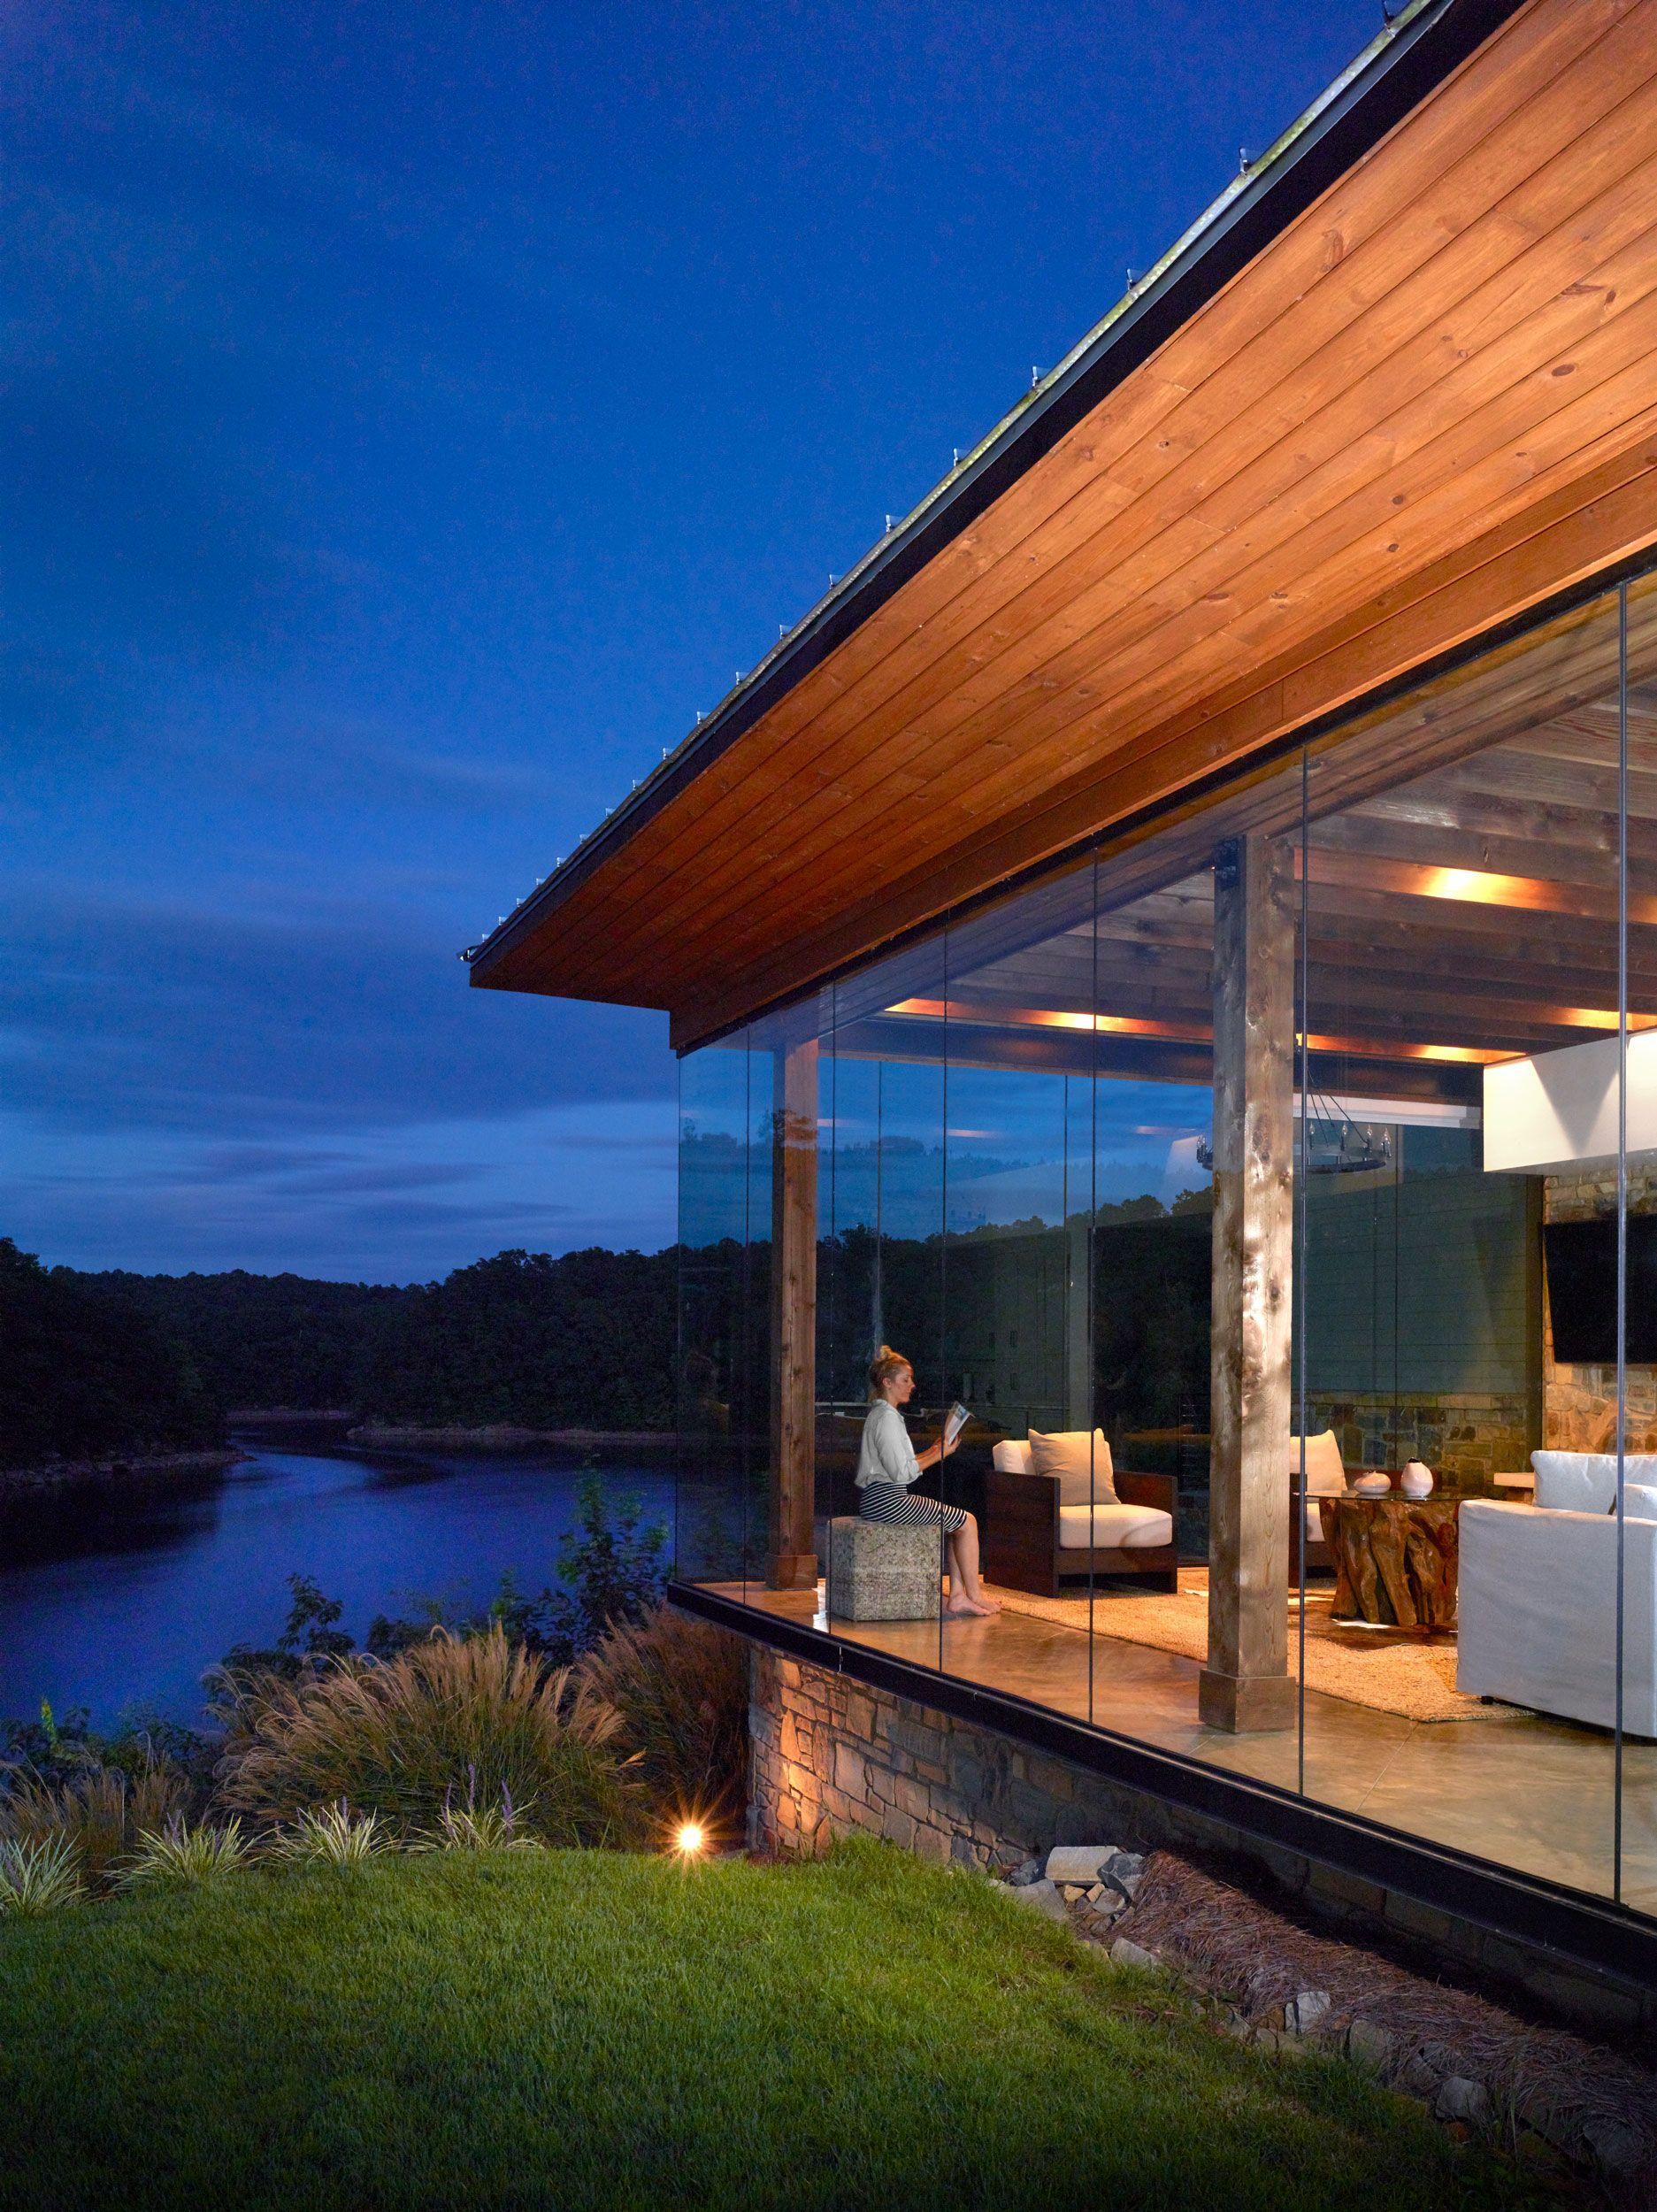 Modern Farmhouse, Lake House Living | Christopher | Architecture ...